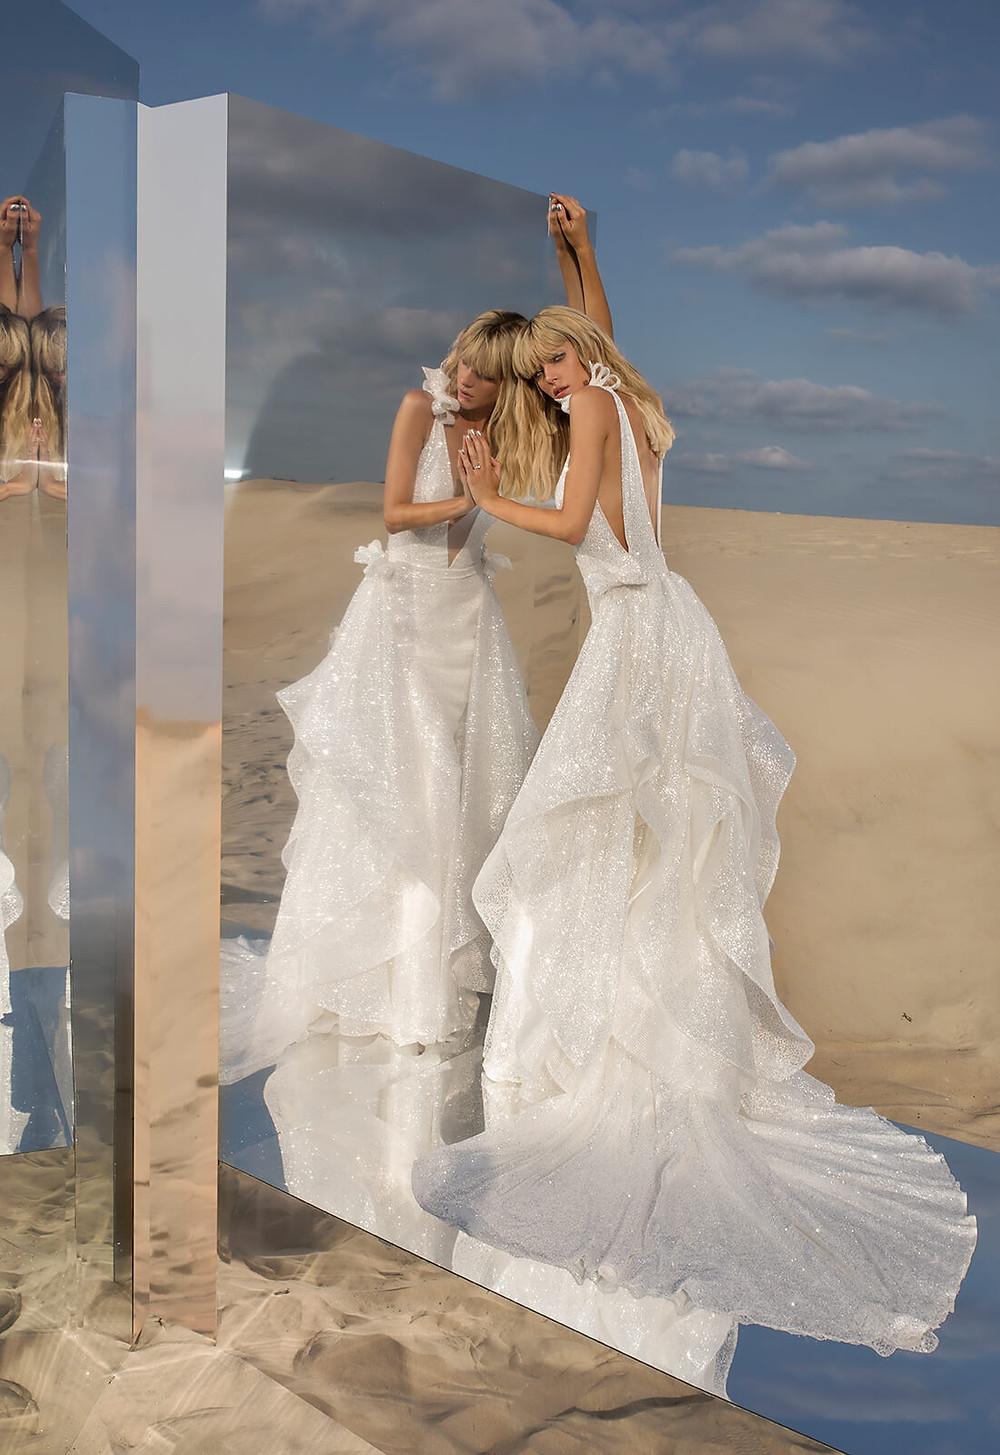 Weddinspired | 50+ Detachable Skirt Wedding Dresses | Pnina Tornai from the Fragile collection